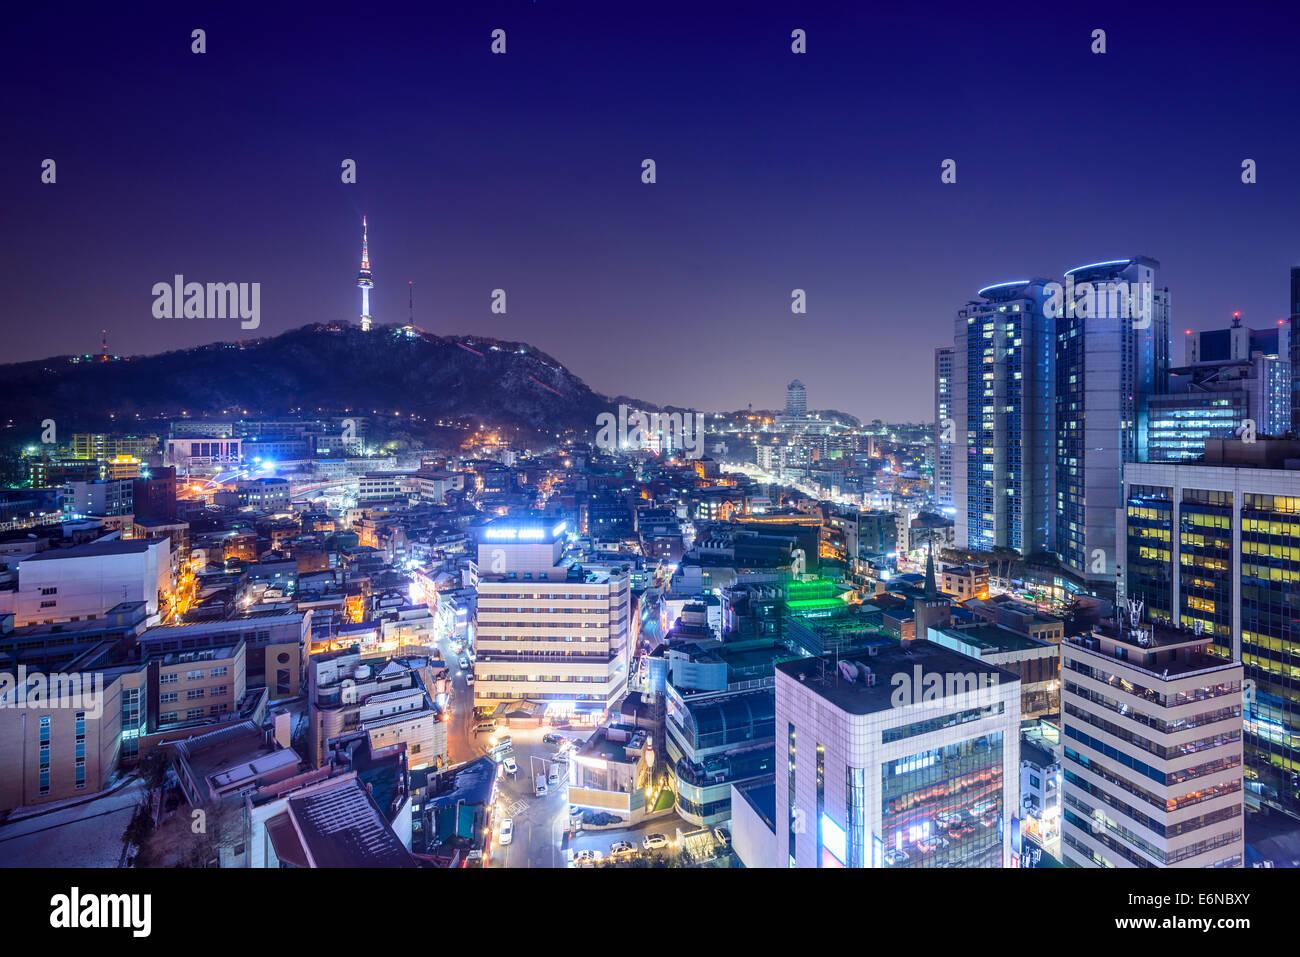 Seúl, Corea del Sur skyline en la noche. Imagen De Stock